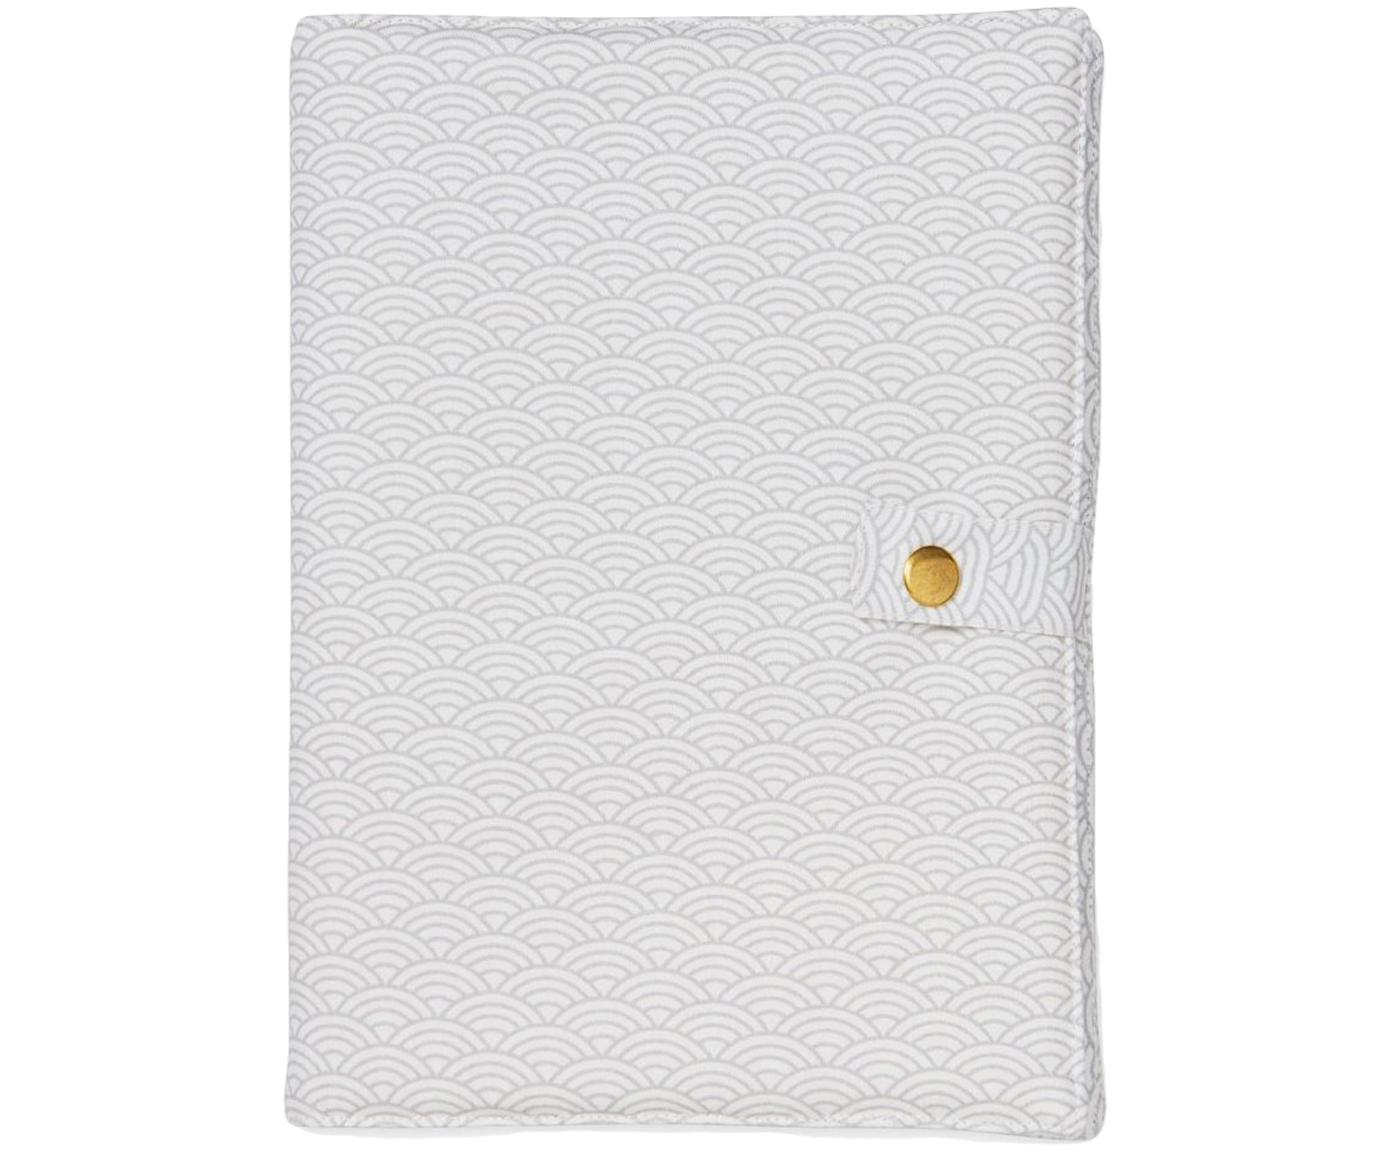 Copertina cotone organico per diario nascita Wave, Cotone organico, certificato OCS, Grigio, bianco, Larg. 15 x Alt. 21 cm